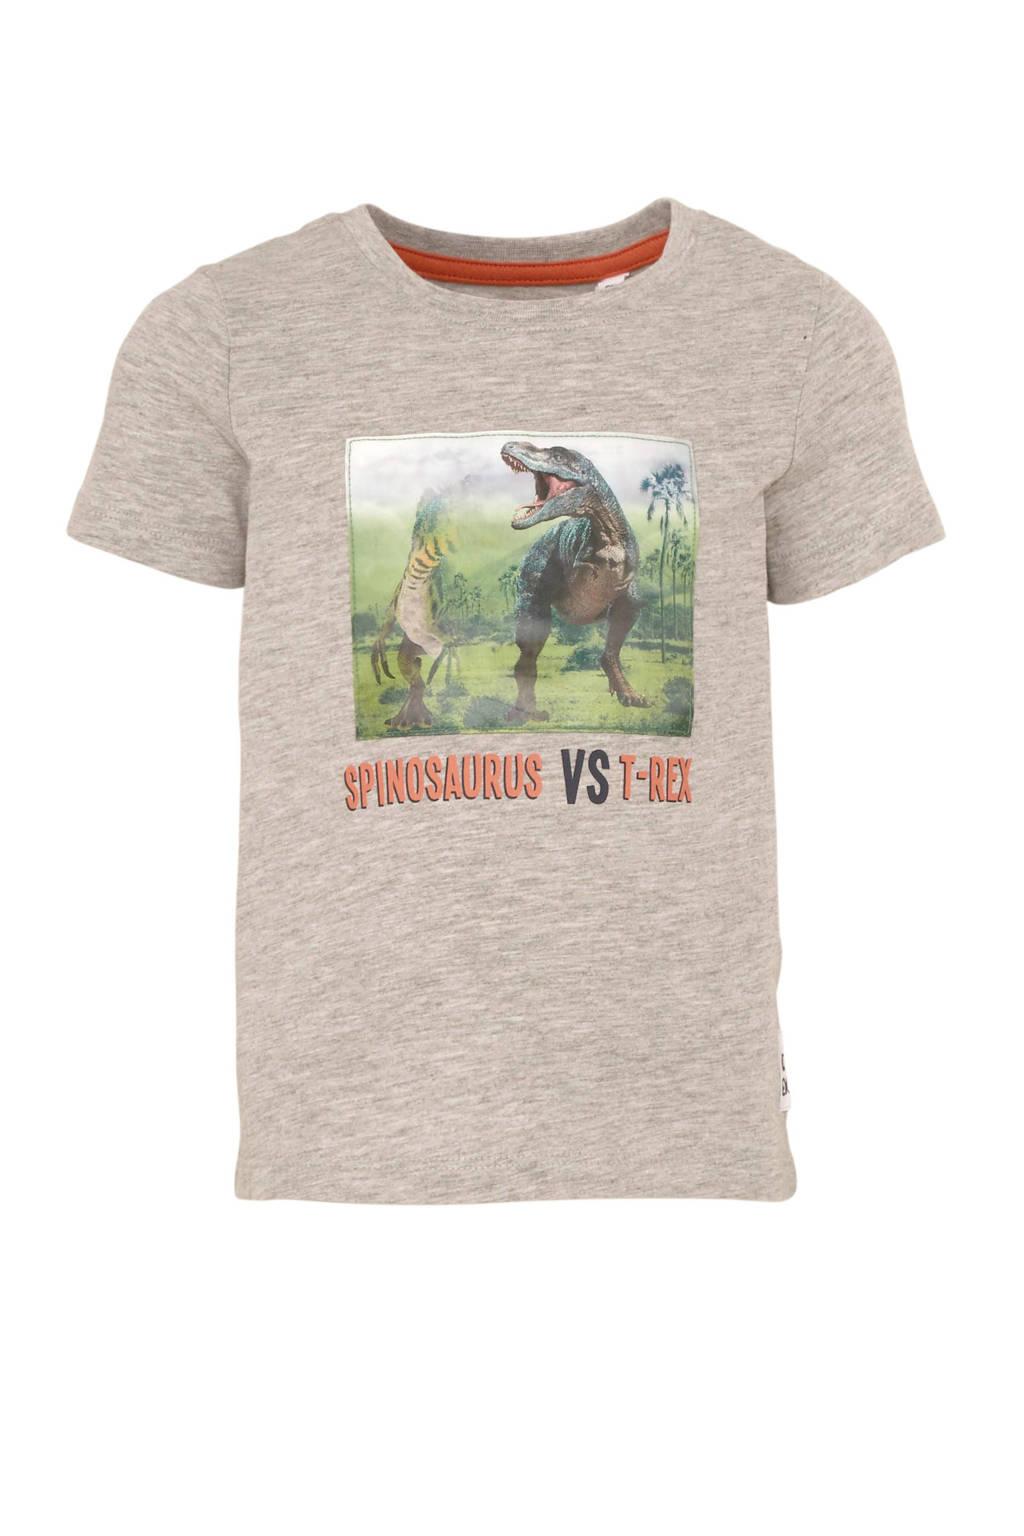 C&A Palomino T-shirt met printopdruk grijs melange, Grijs melange